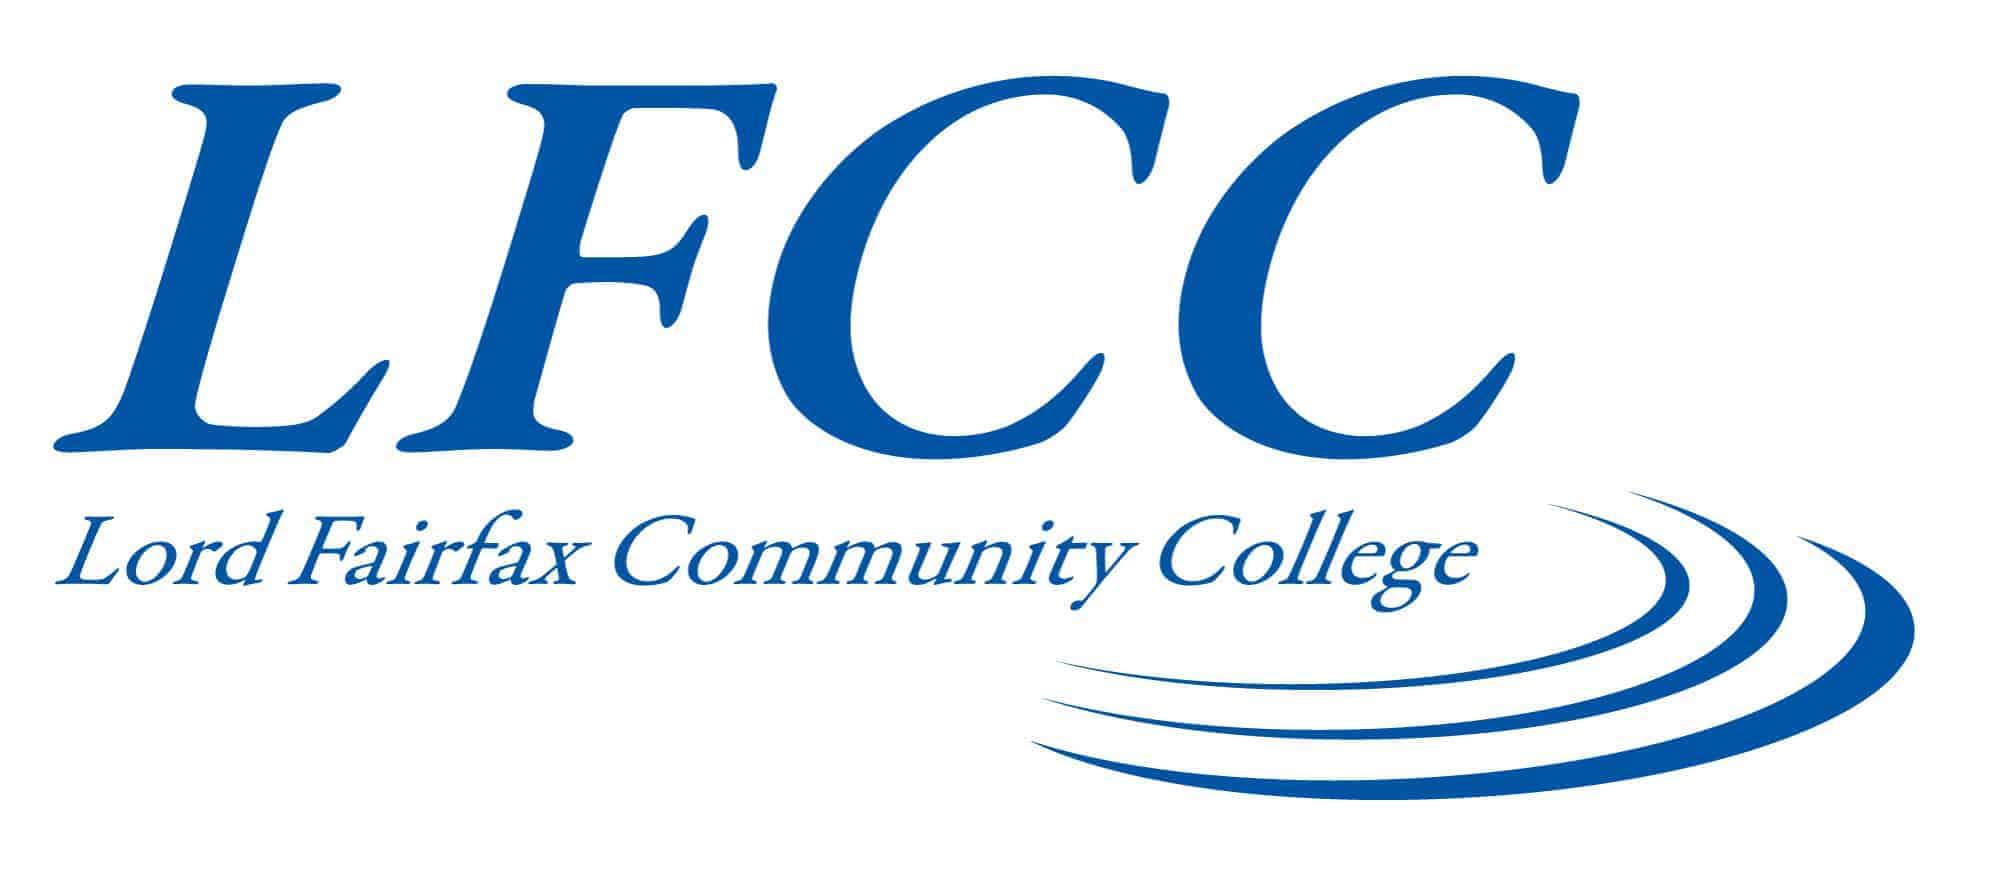 lord fairfax community college logo 7209